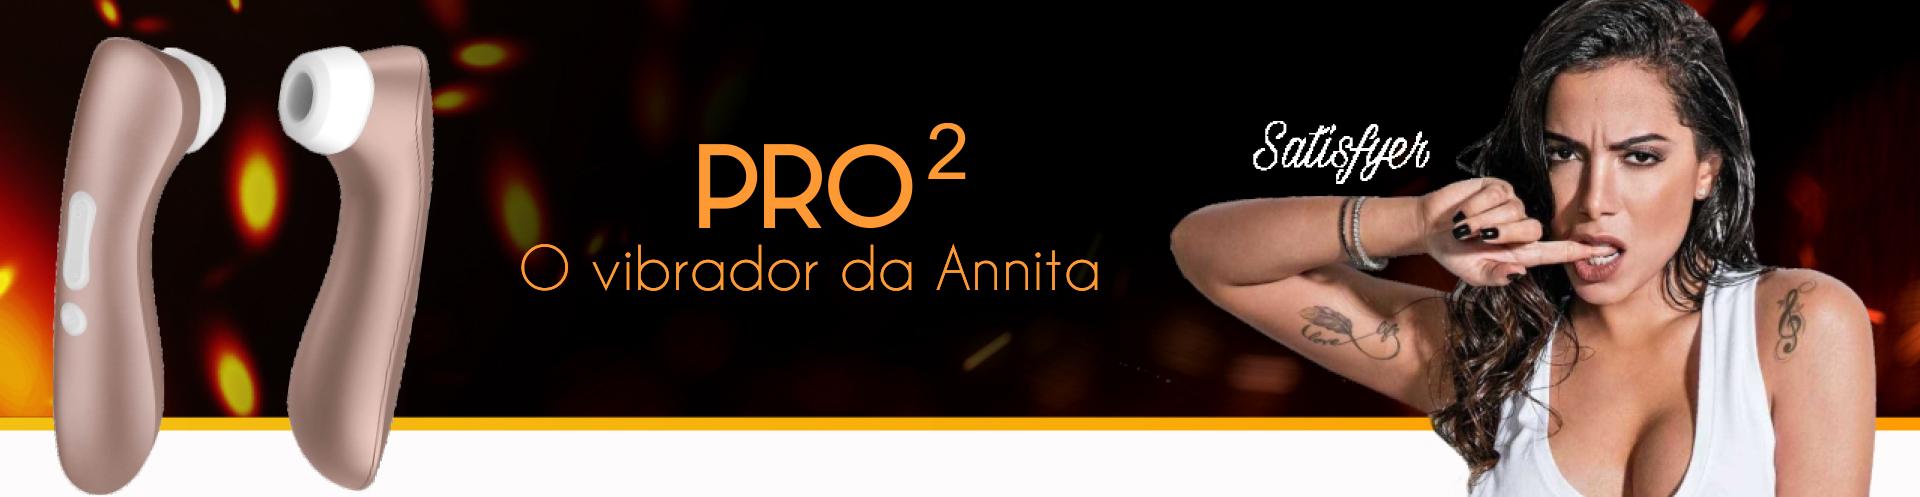 PRO 2